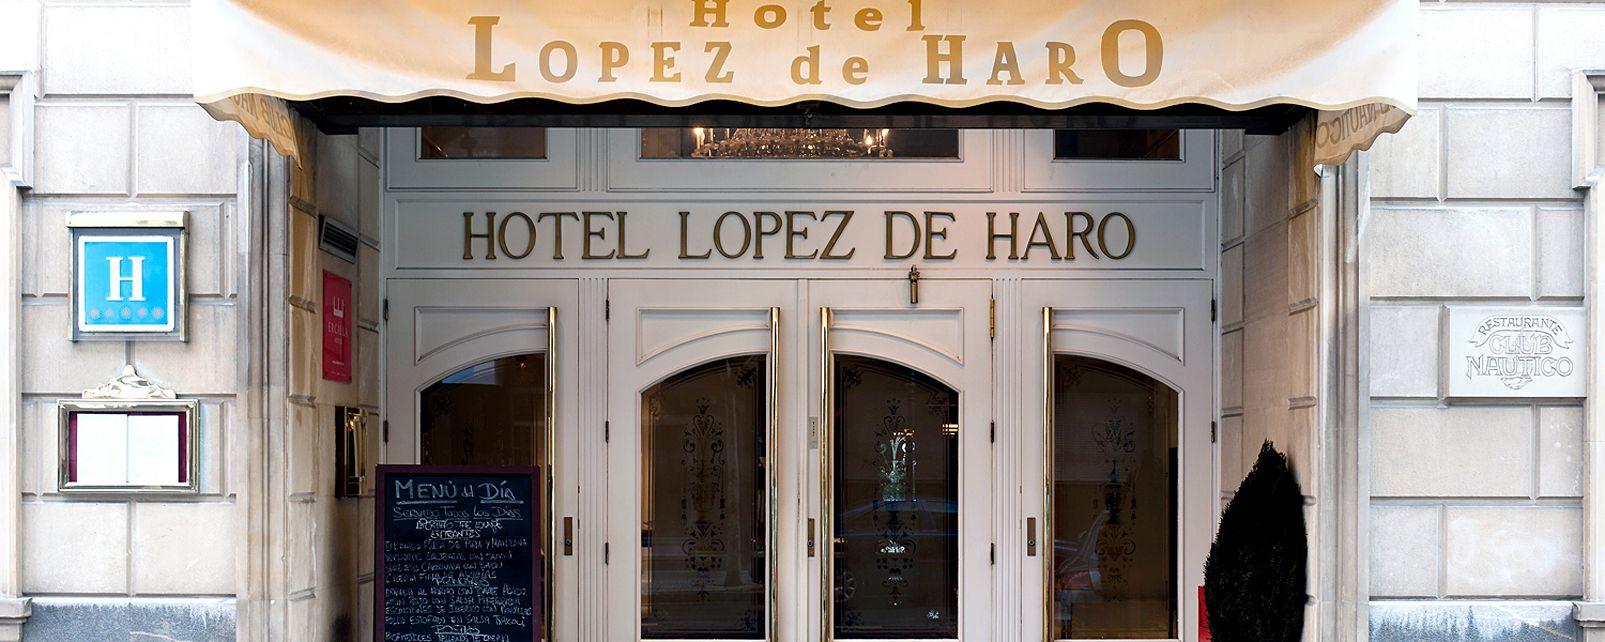 Hôtel Lopez De Haro Bilbao